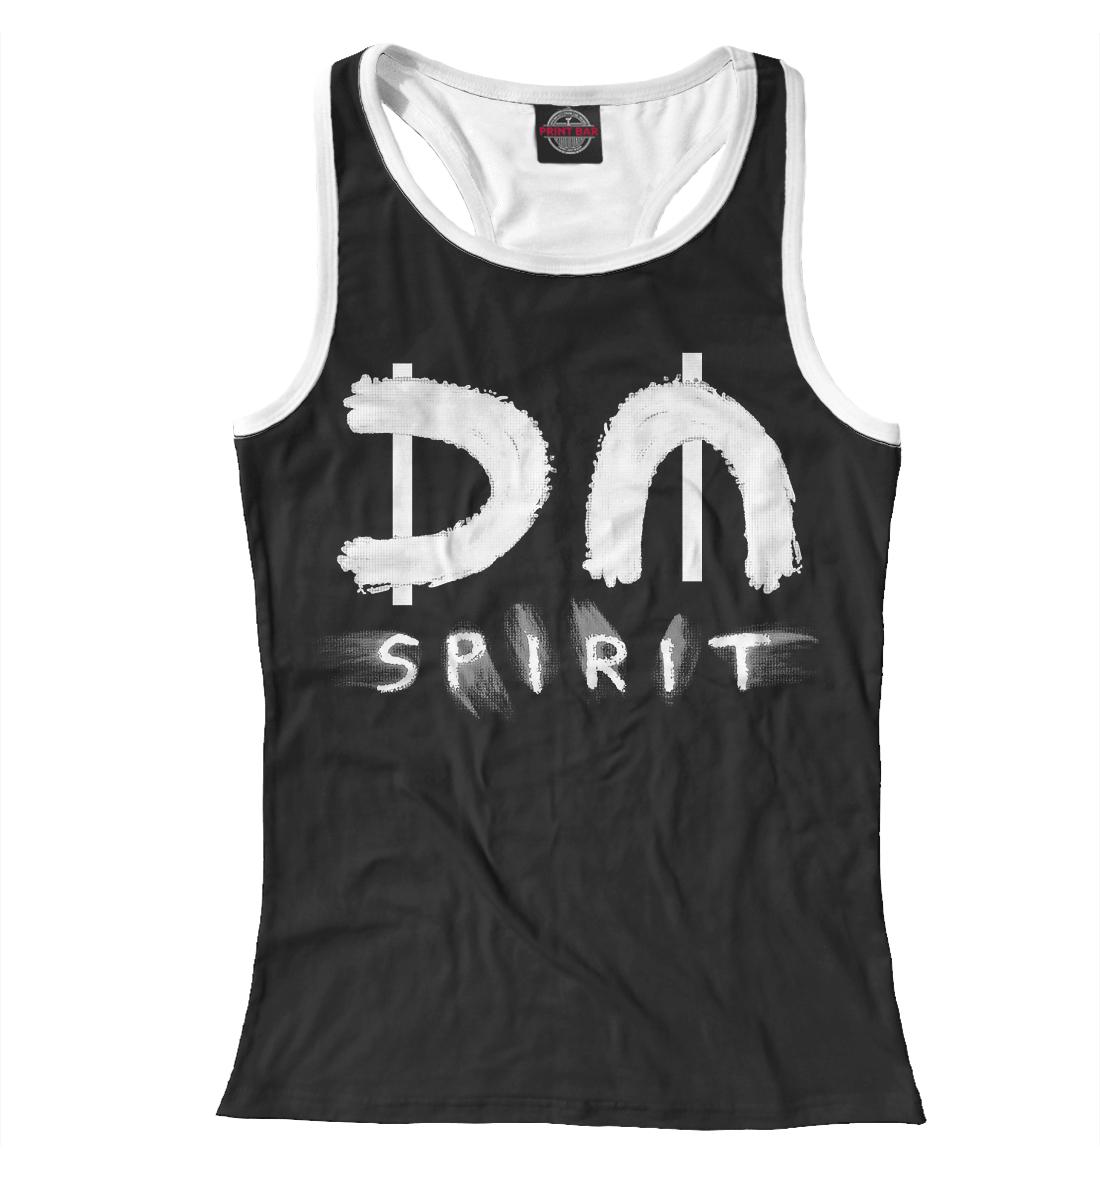 Купить Depeche Mode, Printbar, Майки борцовки, DPM-298019-mayb-1